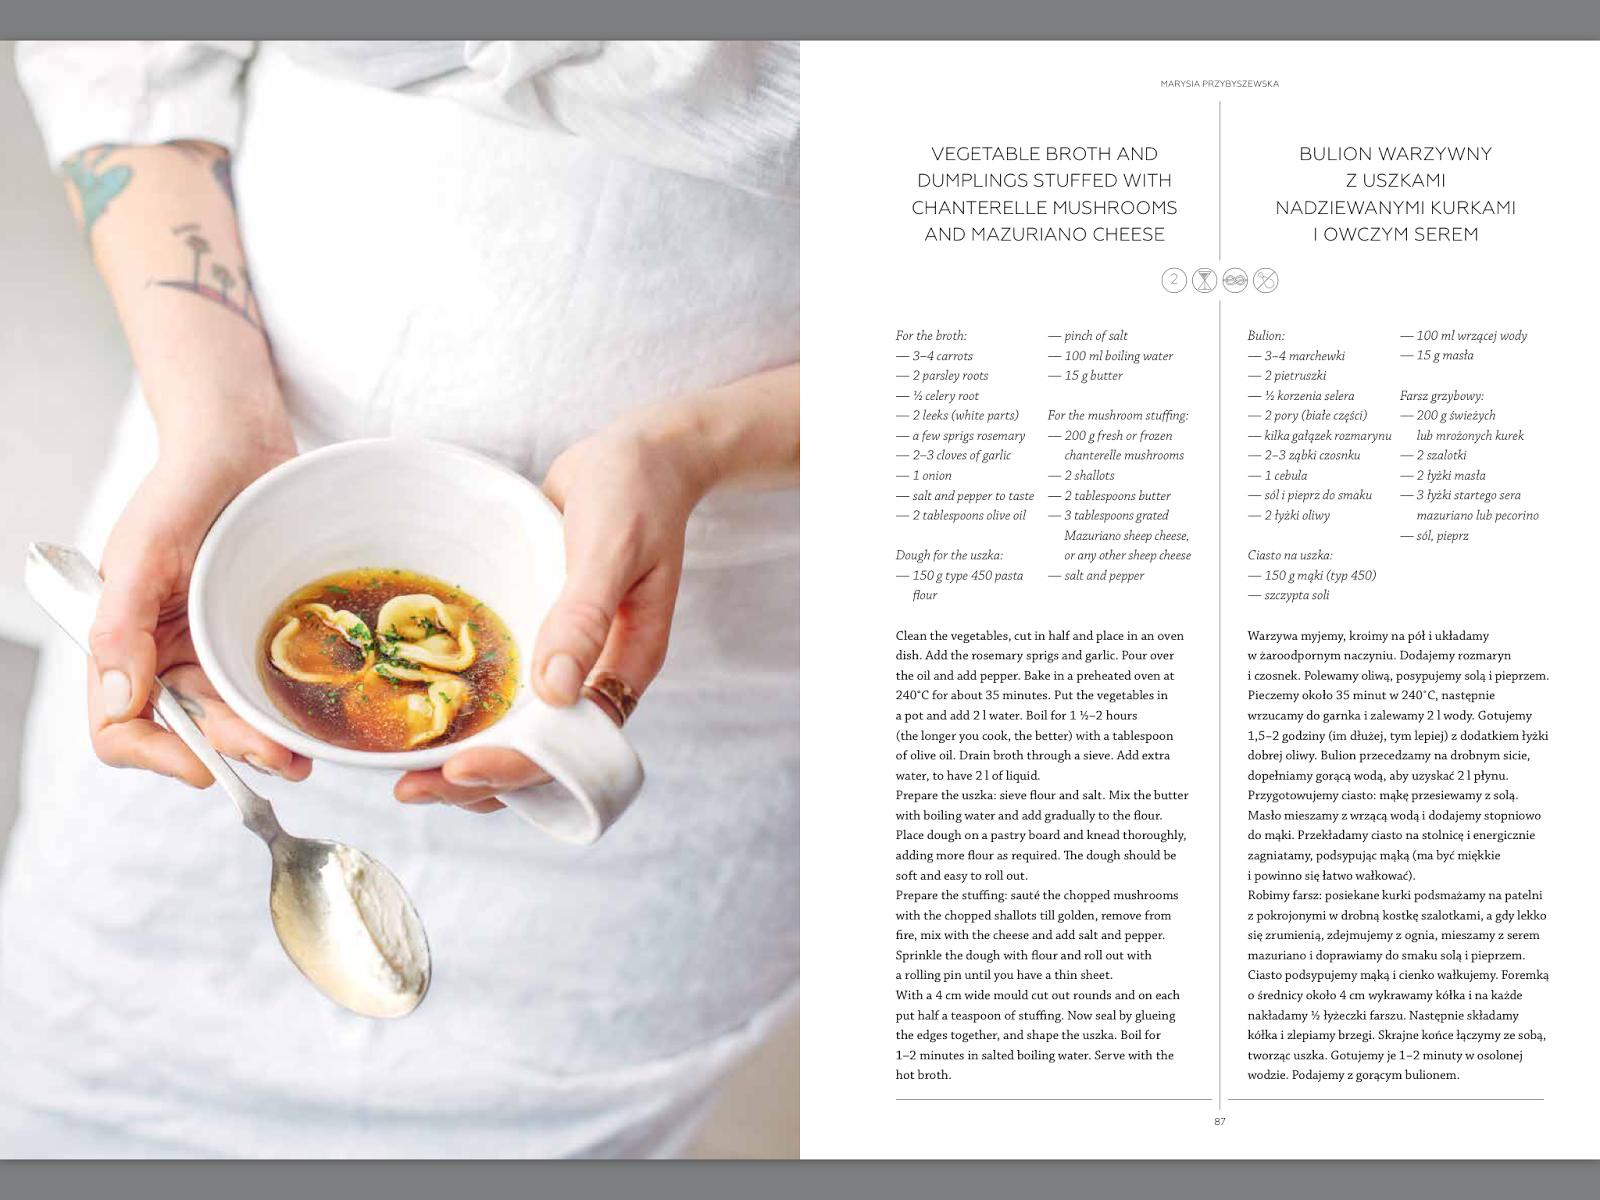 Polska Kuchnia Na Salonach Czyli Apetyt Na Polske Cookbook Appetite Cooking